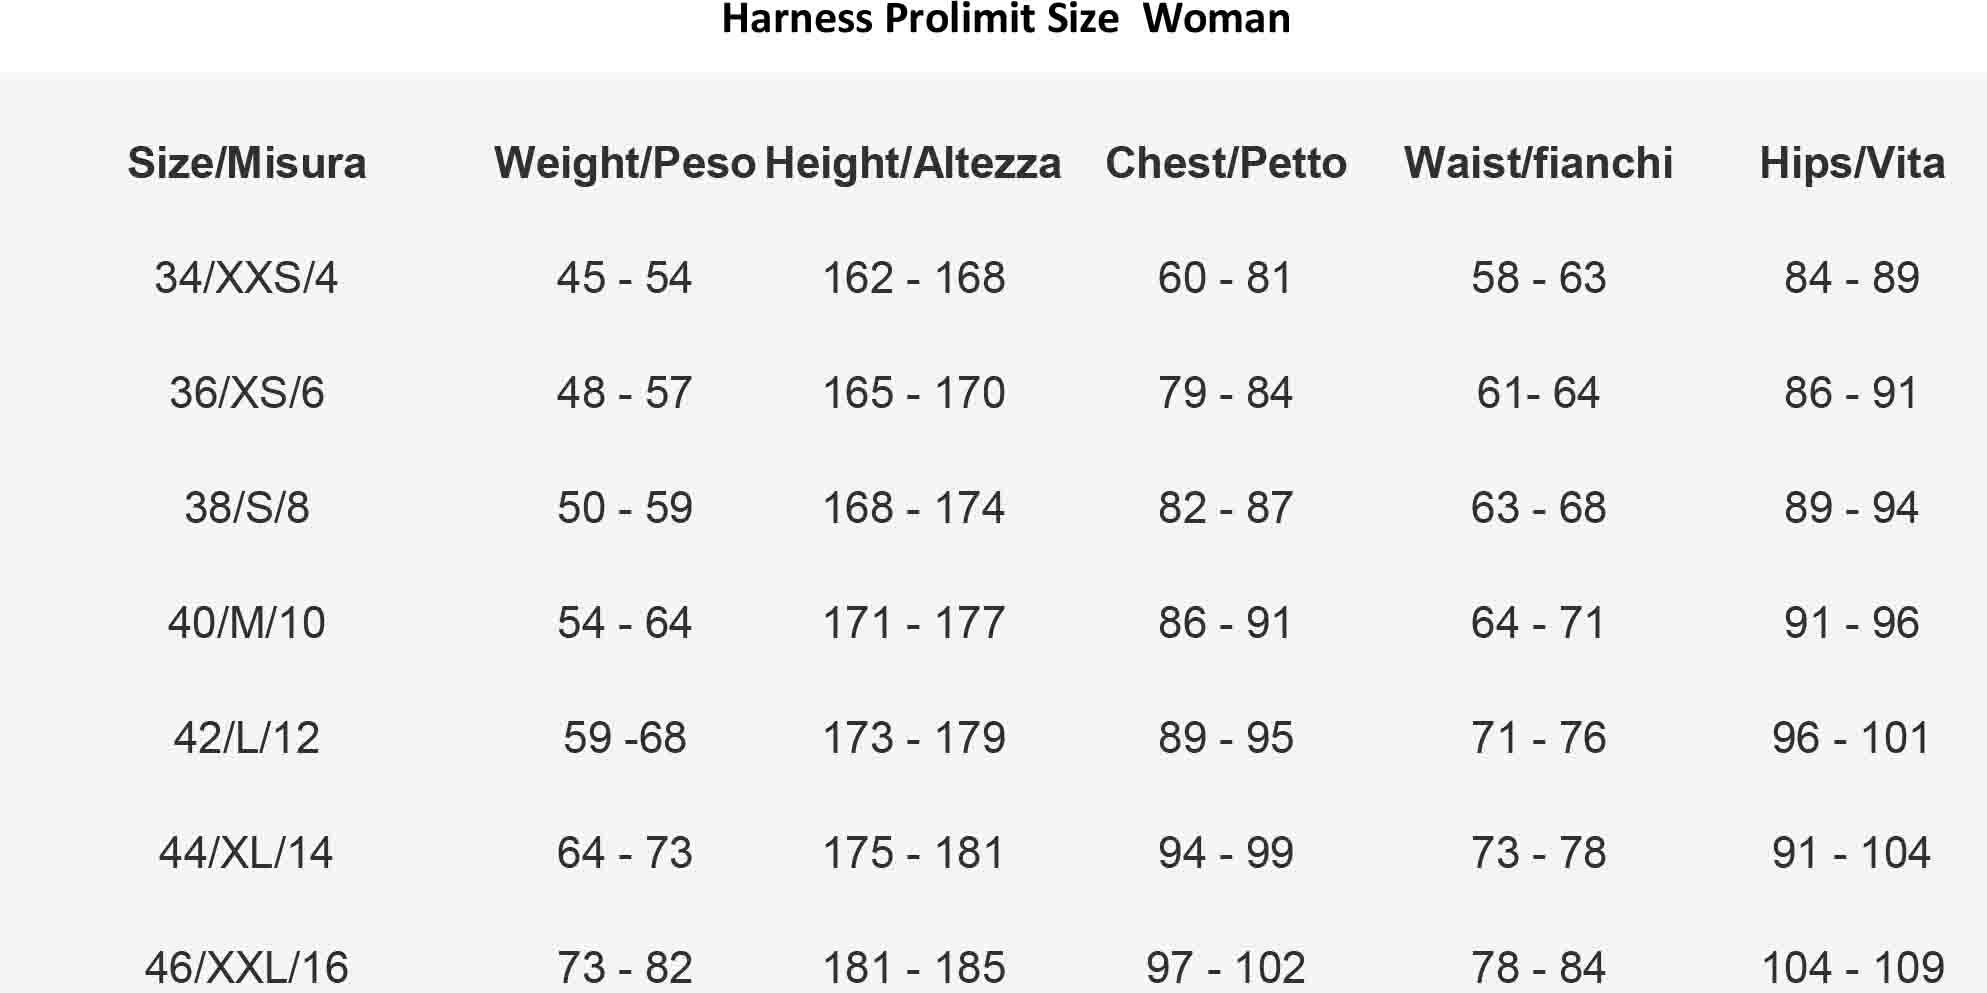 kitesurf-kite-prolimit-harness-woman-size-xxs-s-m-l-xl-trapezio-donna-offerta-kitewaist-seat